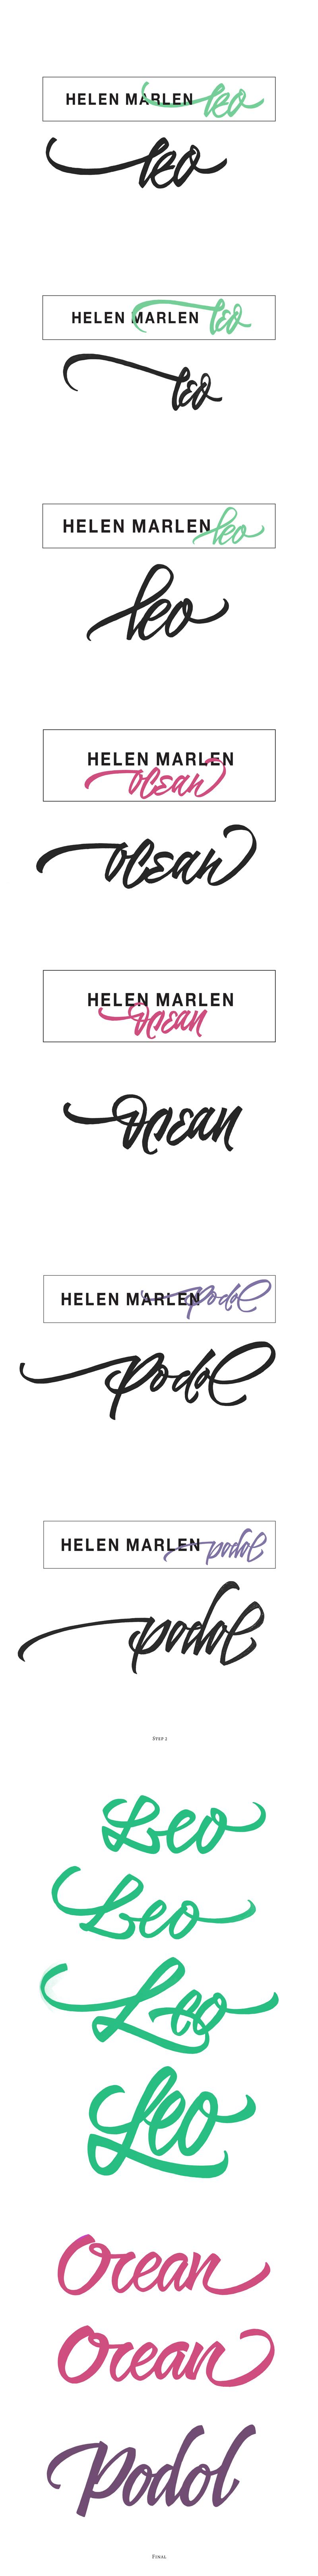 logos_Leo111_2